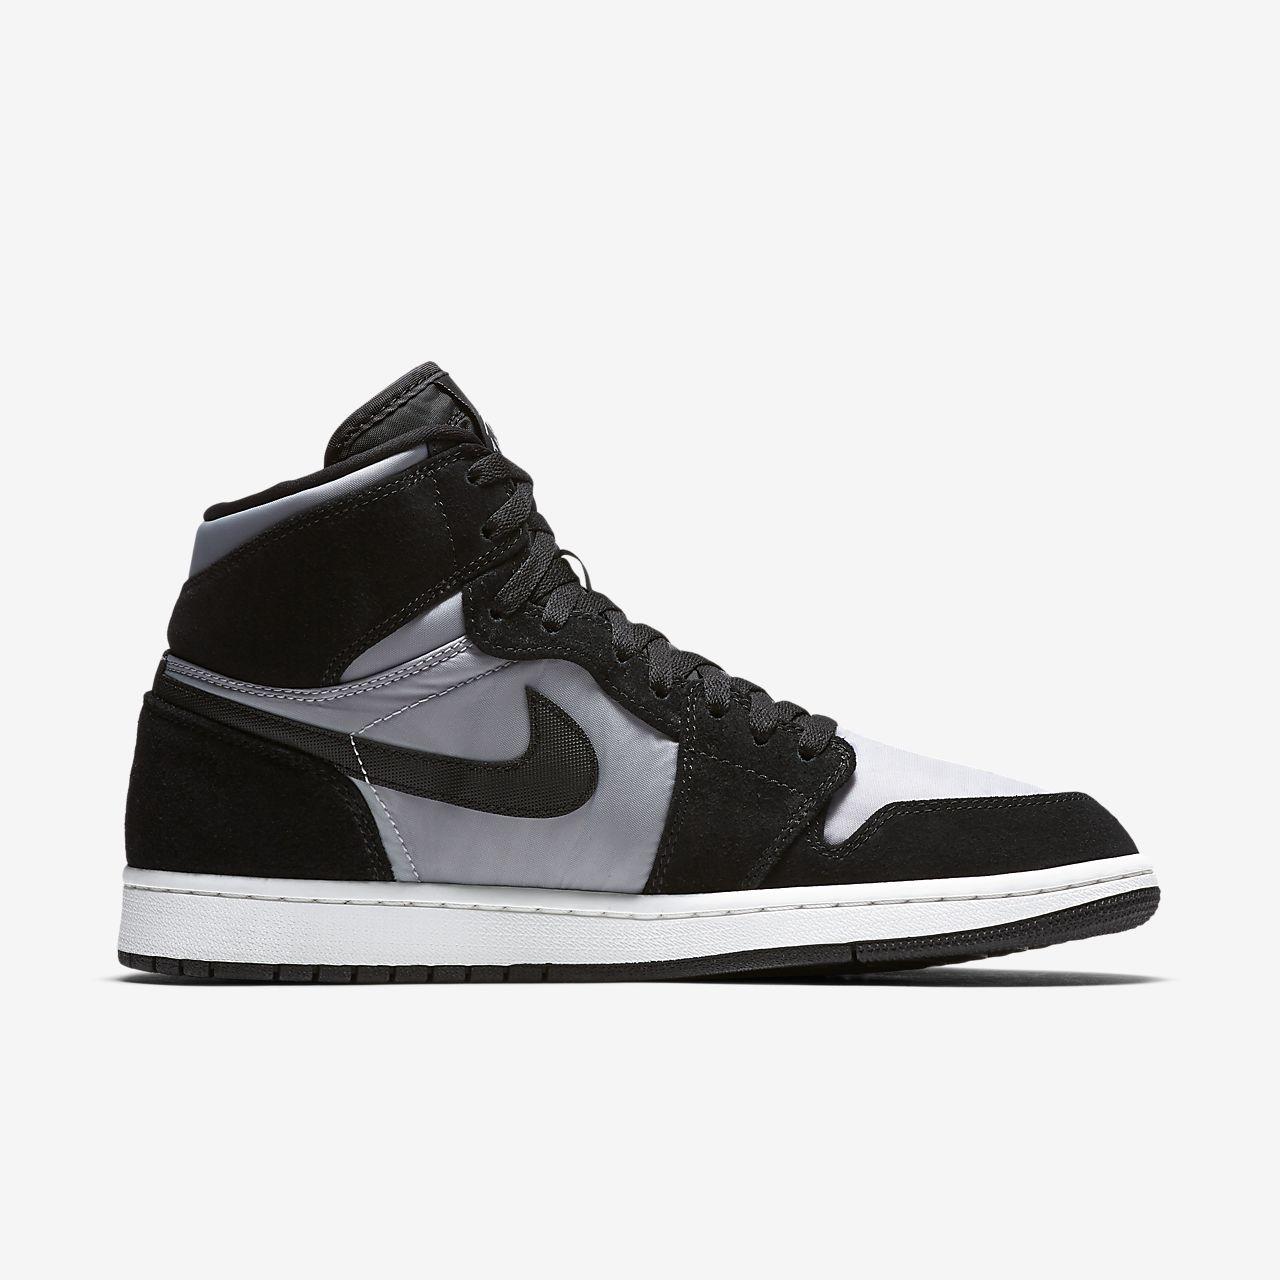 127df40729ef23 Air Jordan 1 Retro High Premium Men s Shoe. Nike.com SG